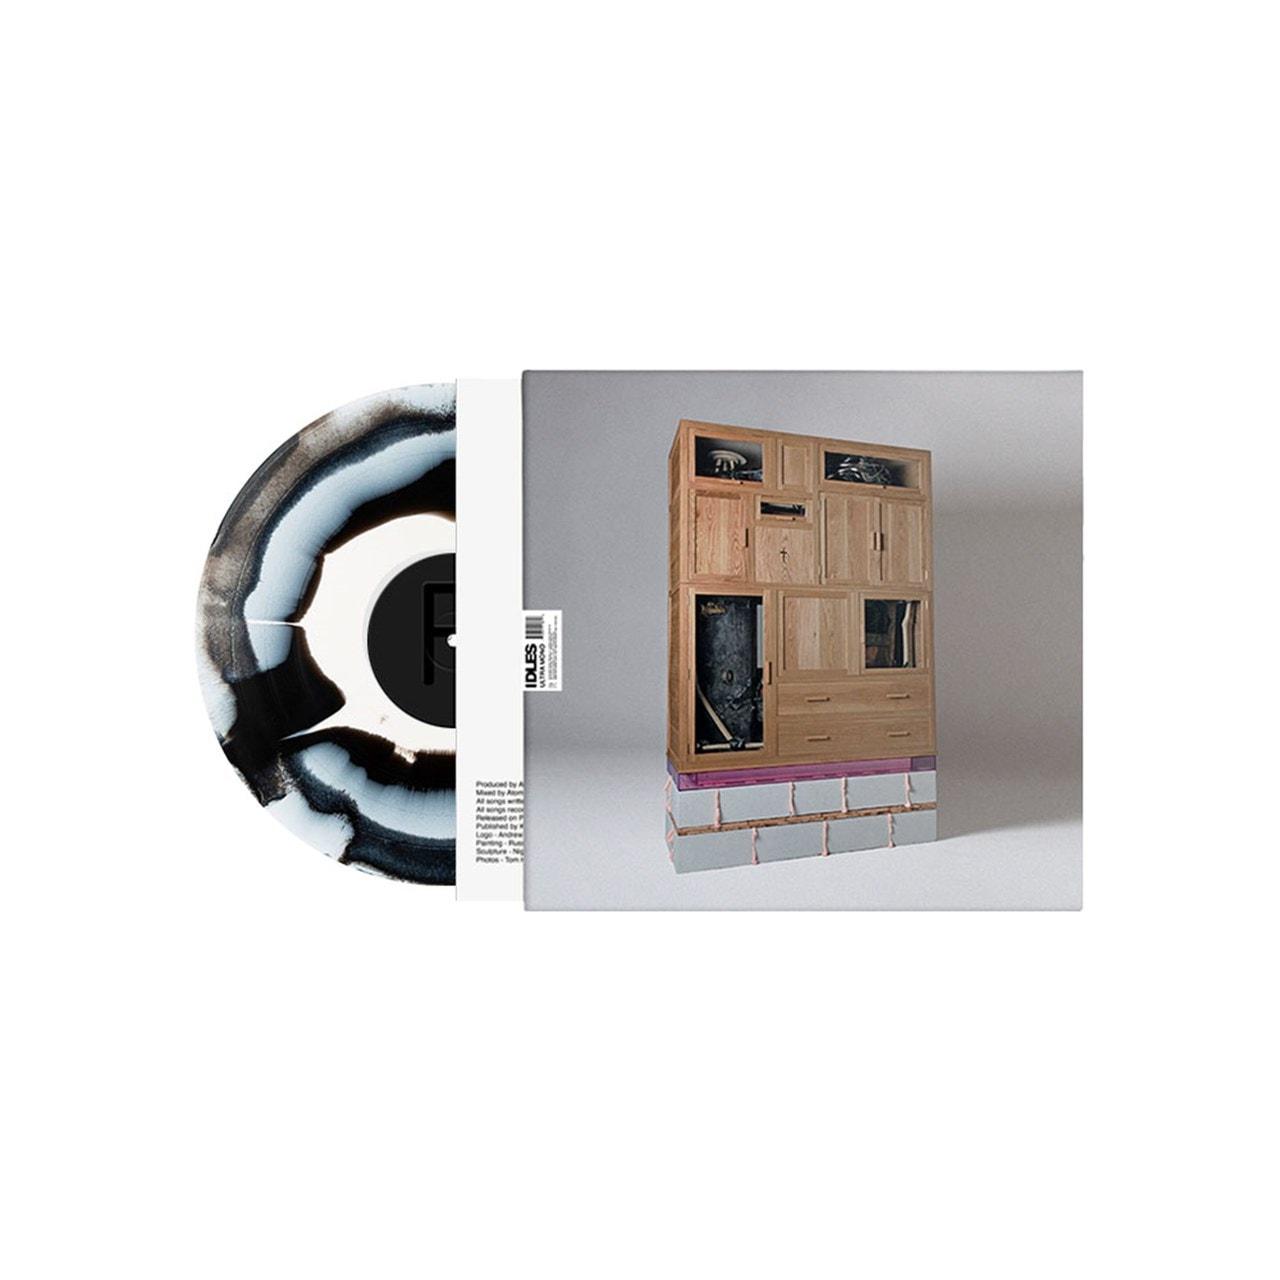 Ultra Mono (Limited Edition Vortex Vinyl) - 2